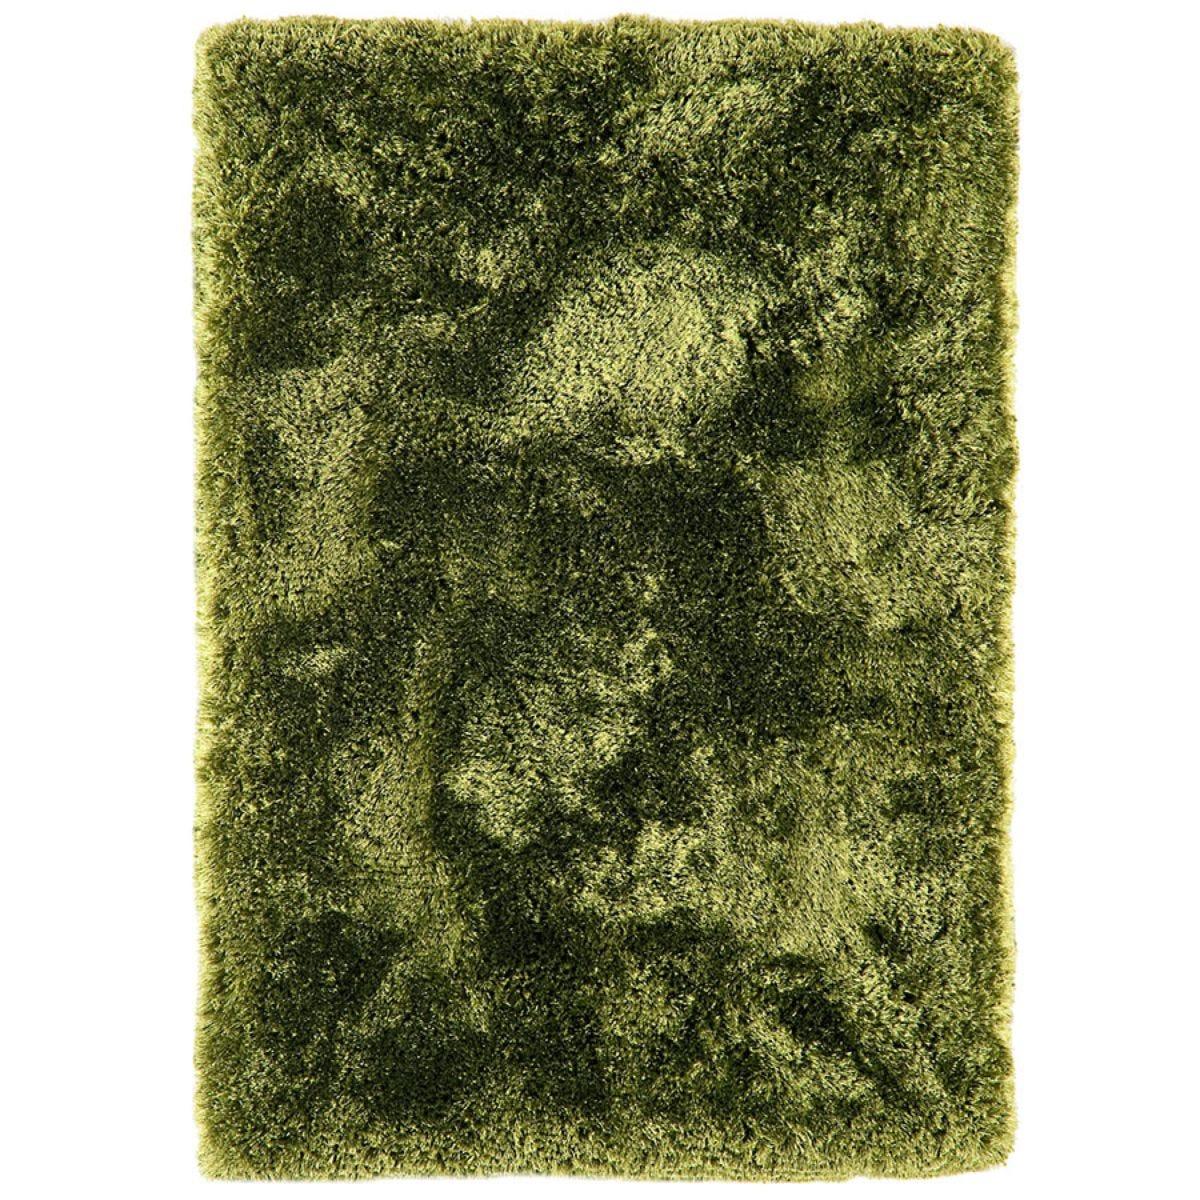 Asiatic Plush Shaggy Rug, 200 x 300cm - Green